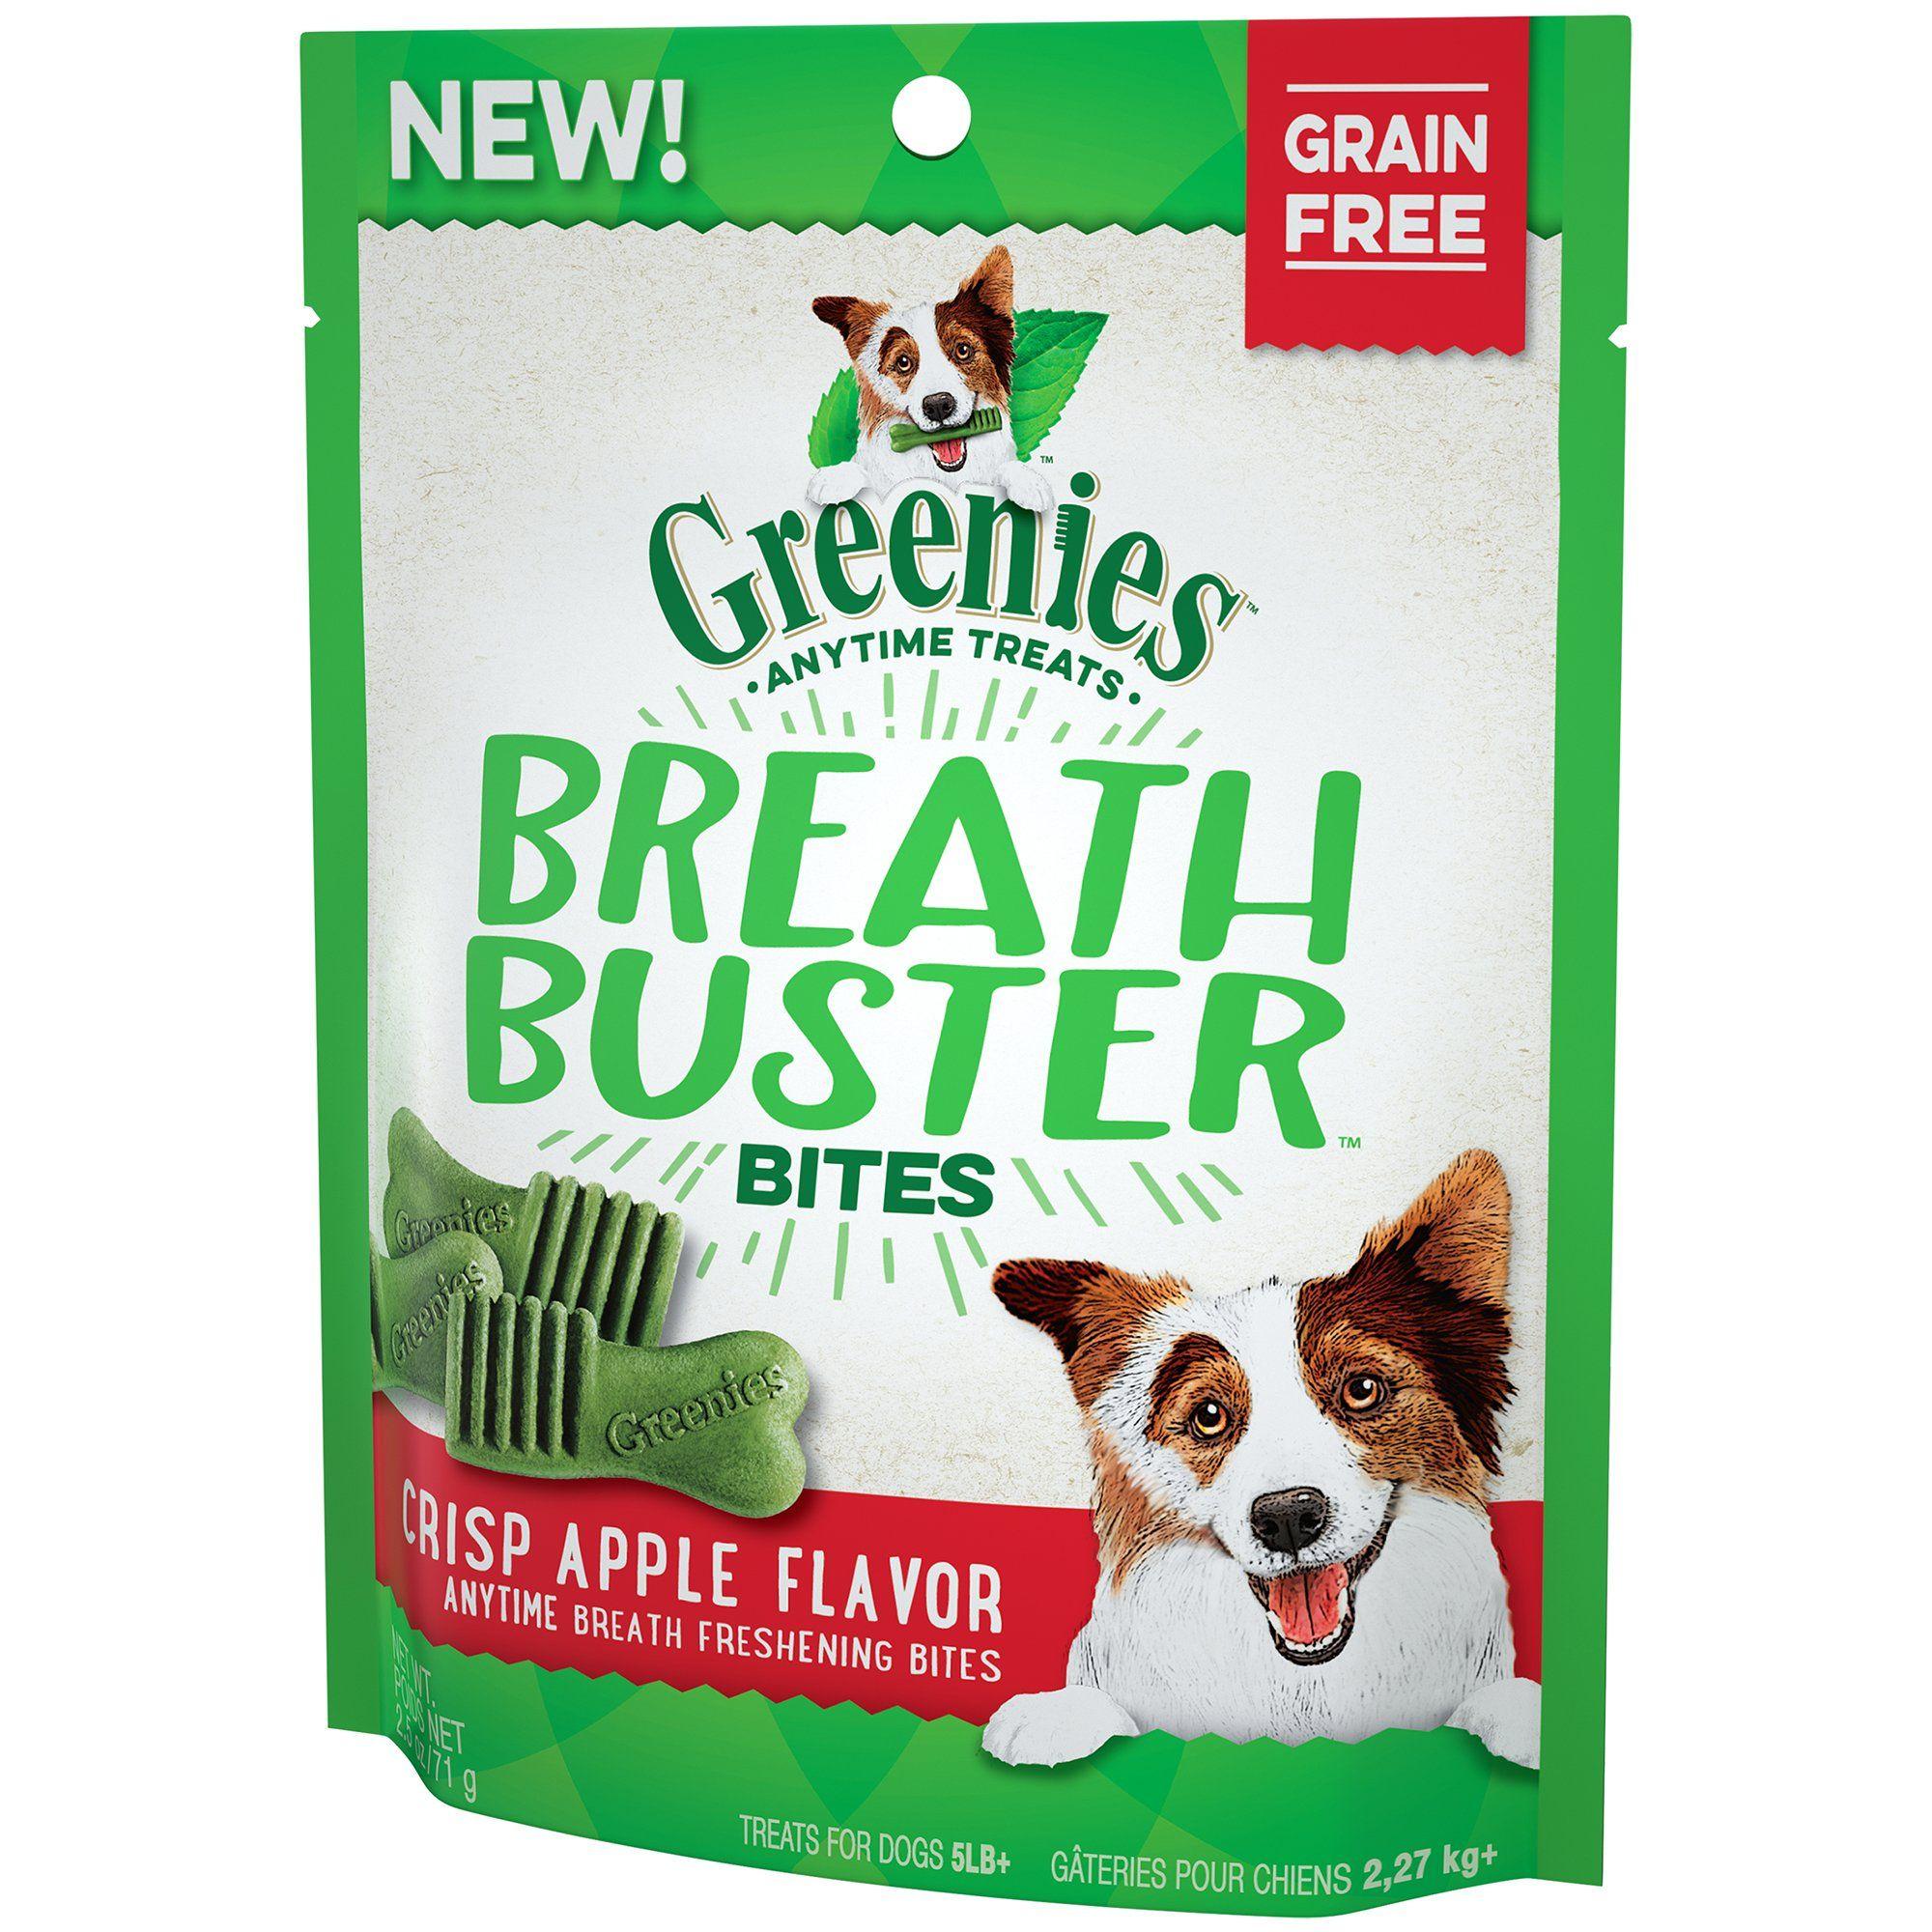 Greenies BREATH BUSTER Bites Crisp Apple Flavor Treats for